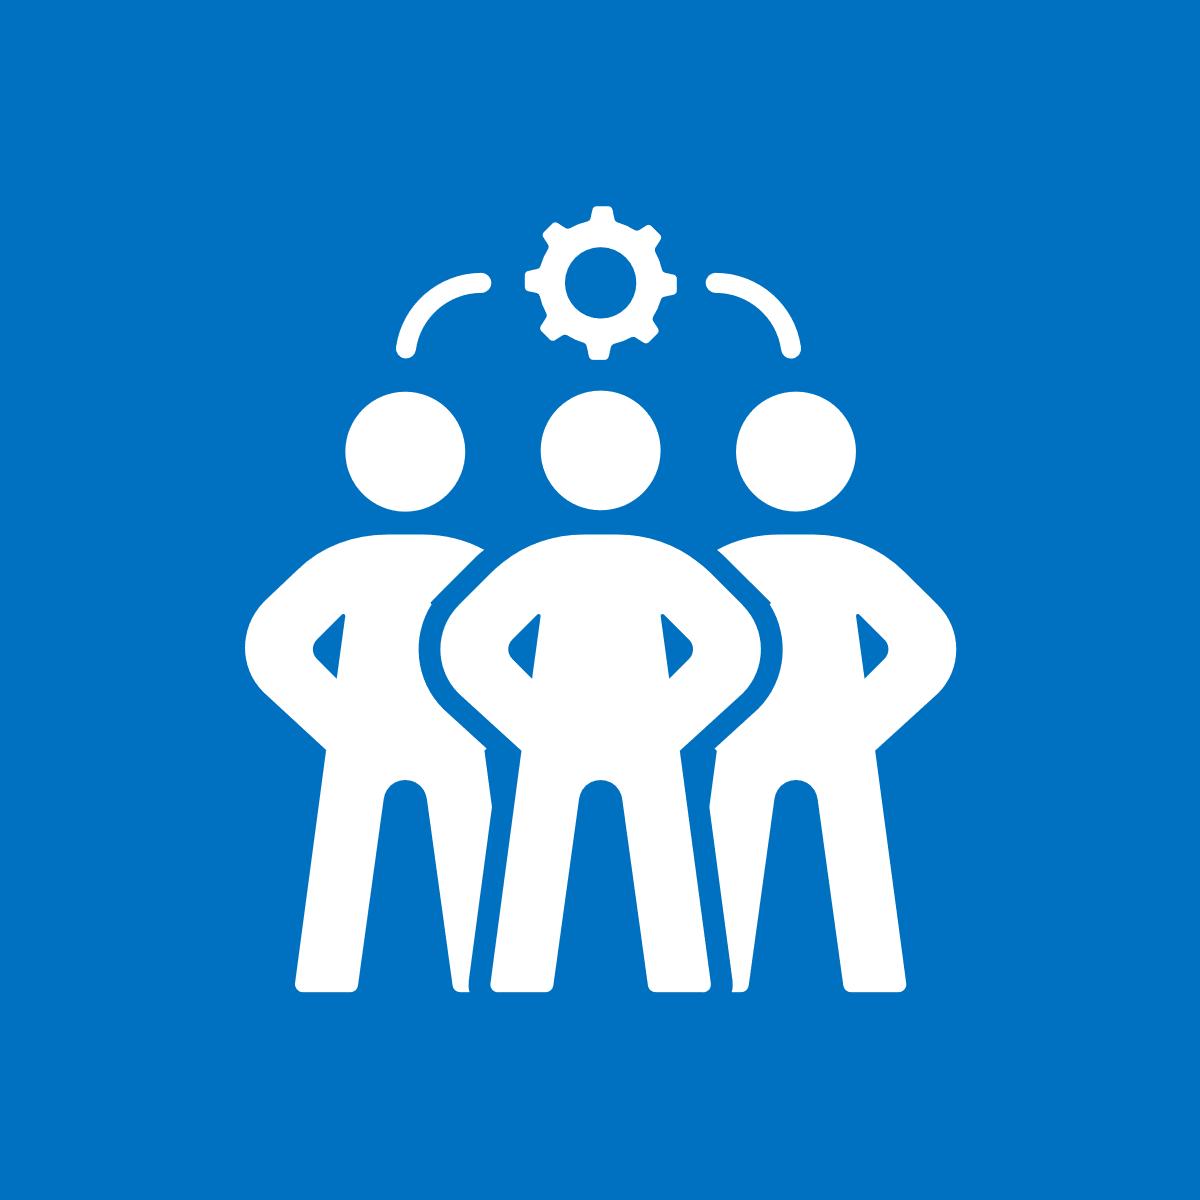 noun_teamwork_1954429